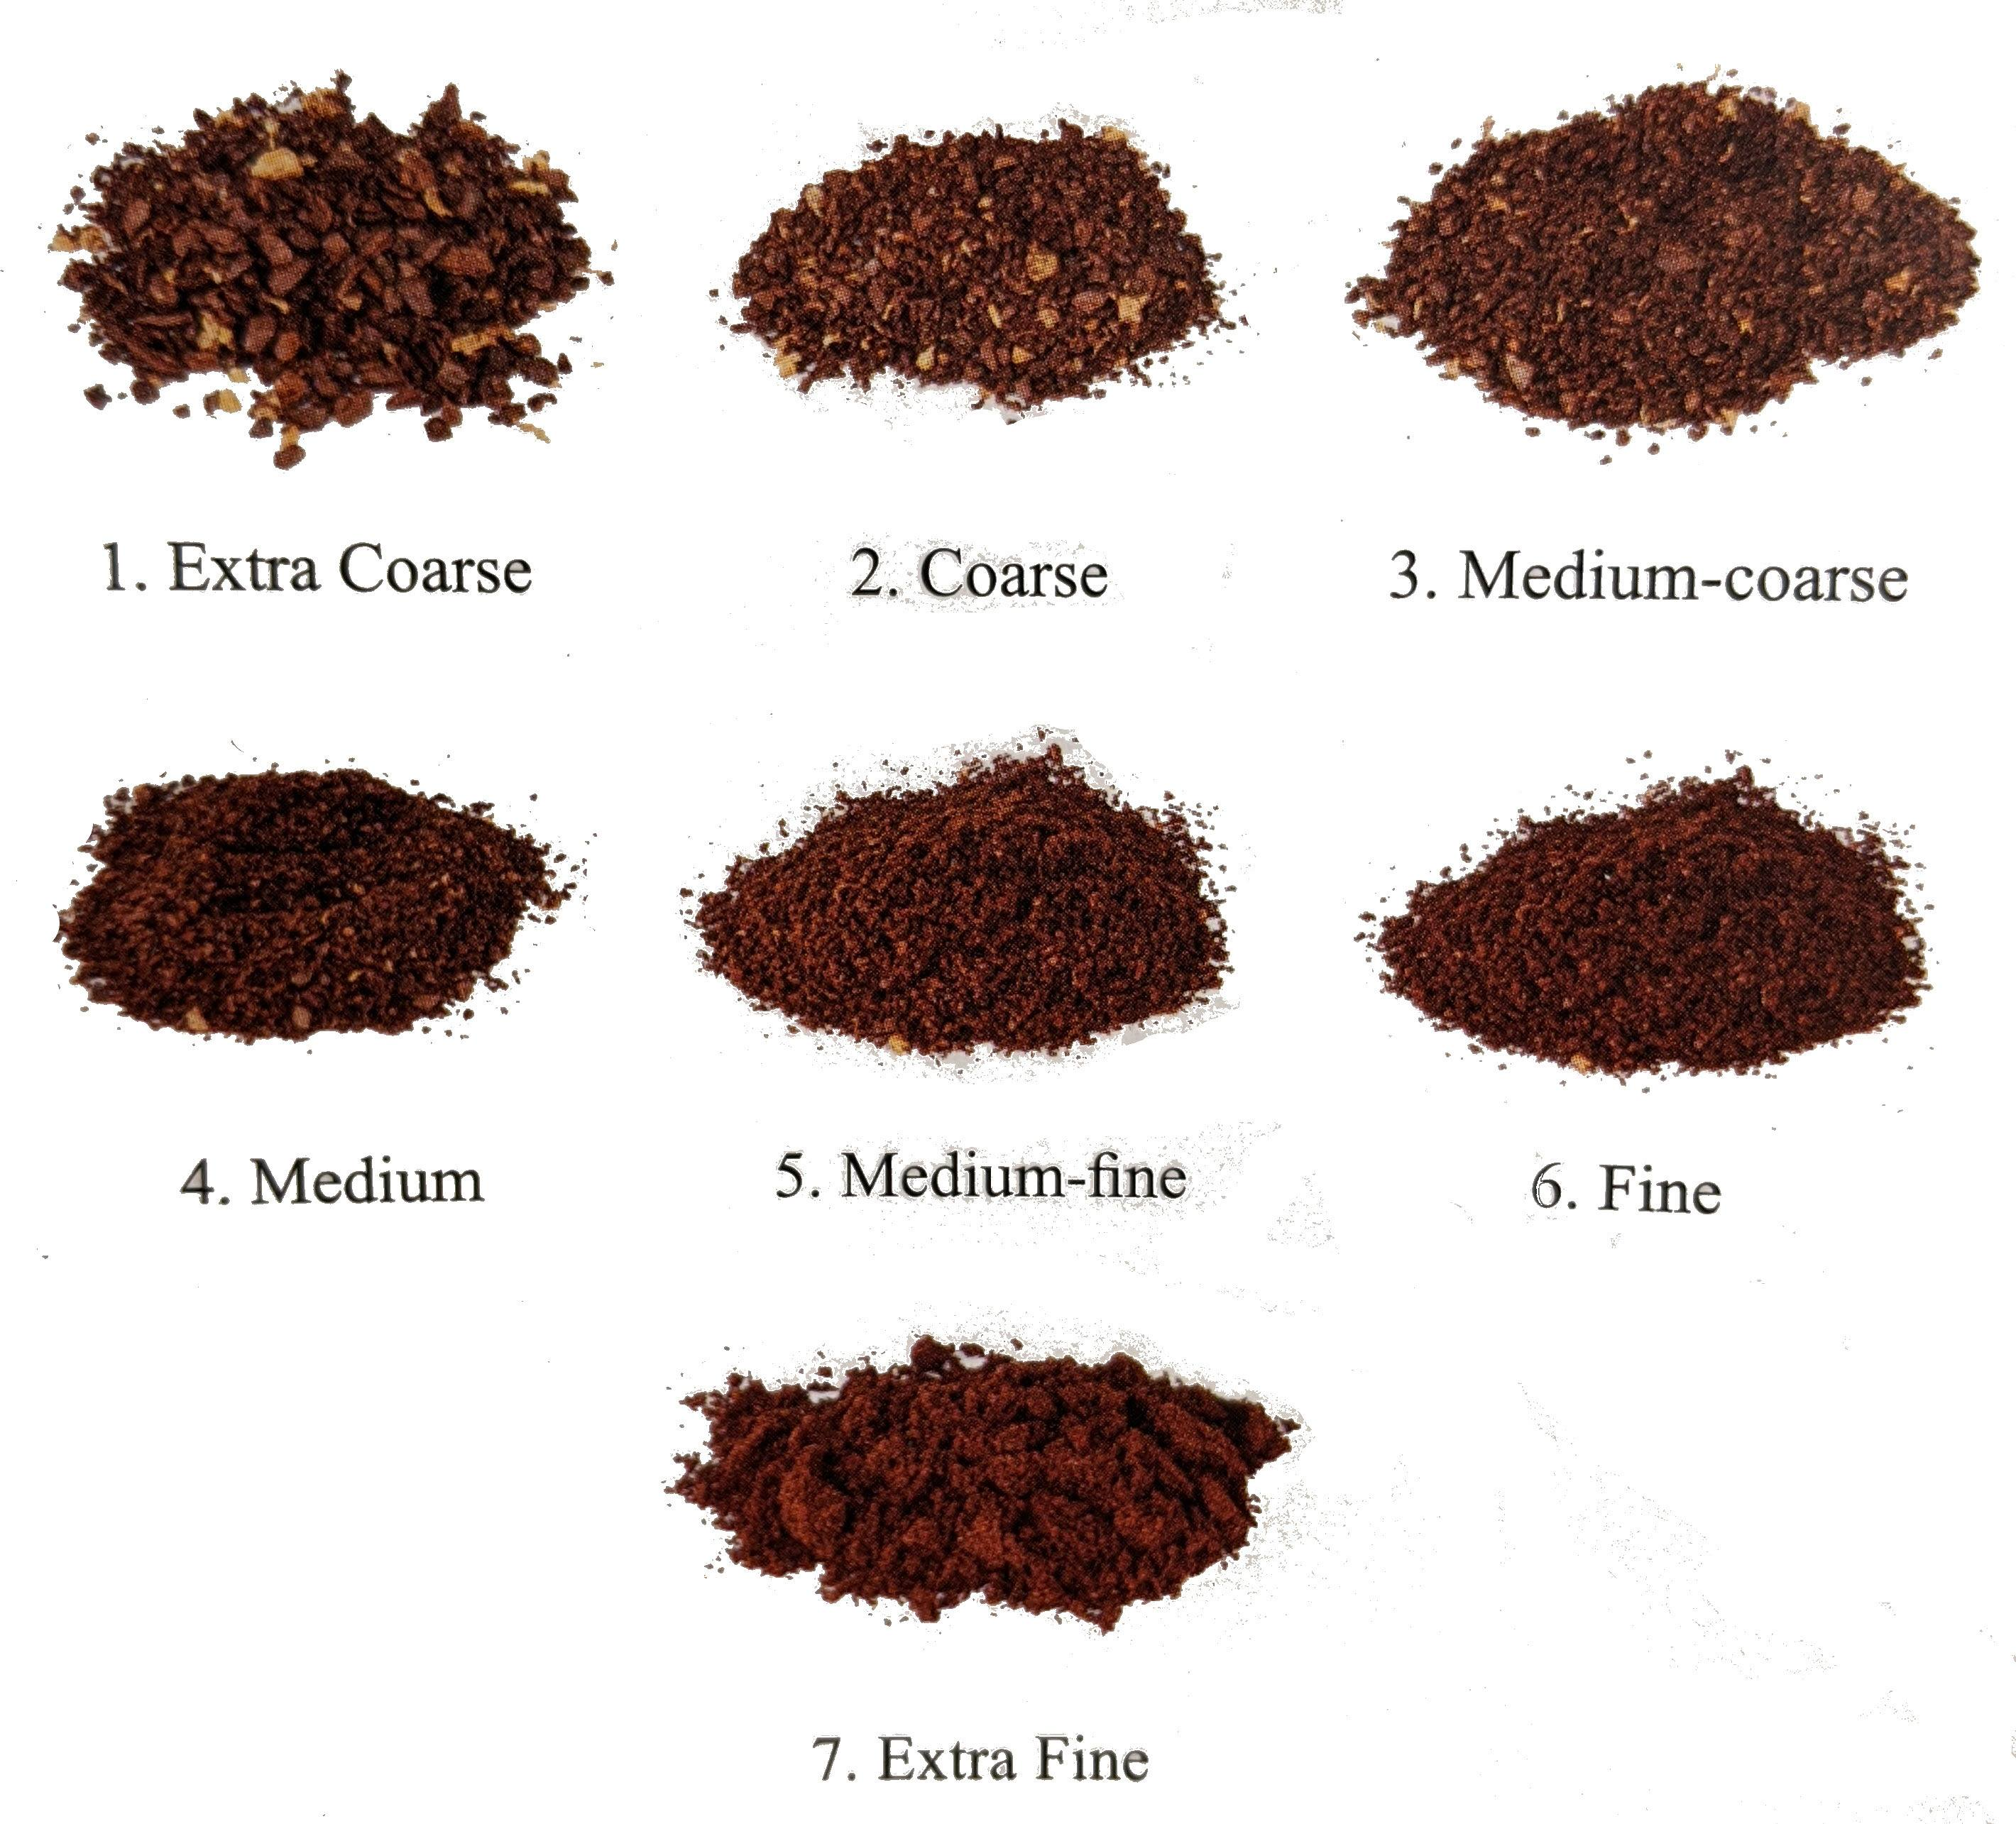 coffee grind textures